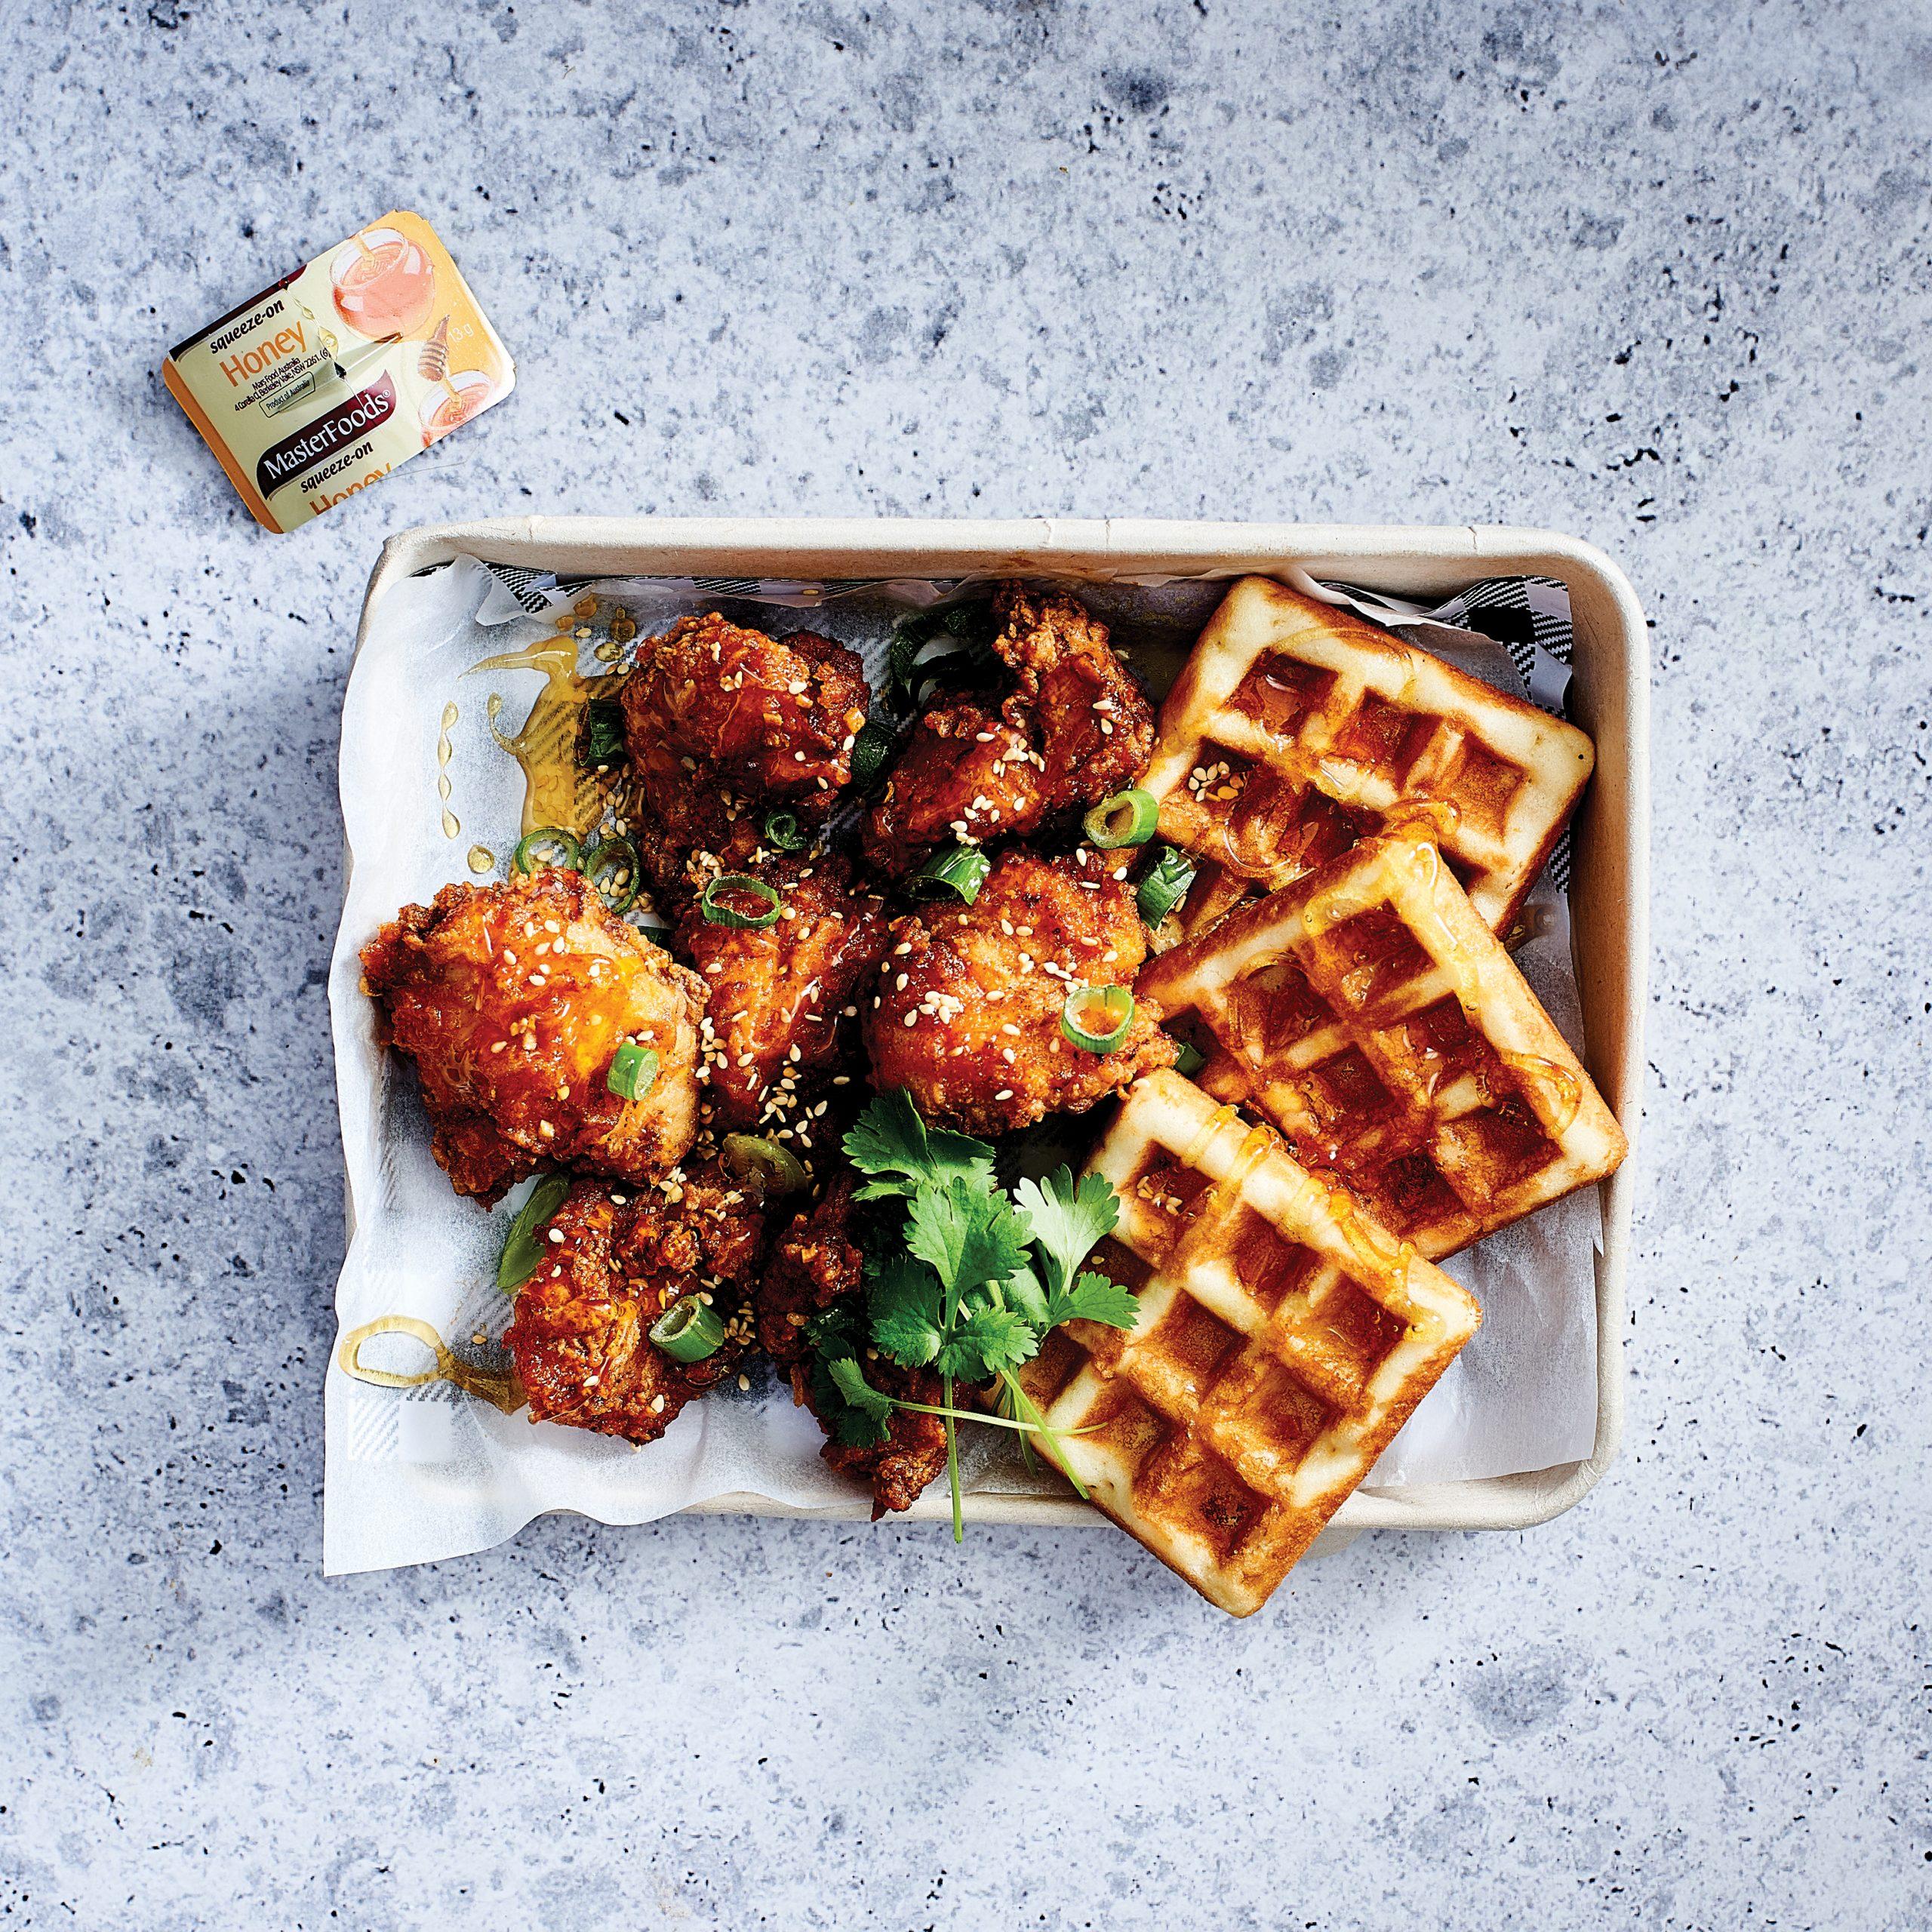 Popcorn Chicken and Waffles